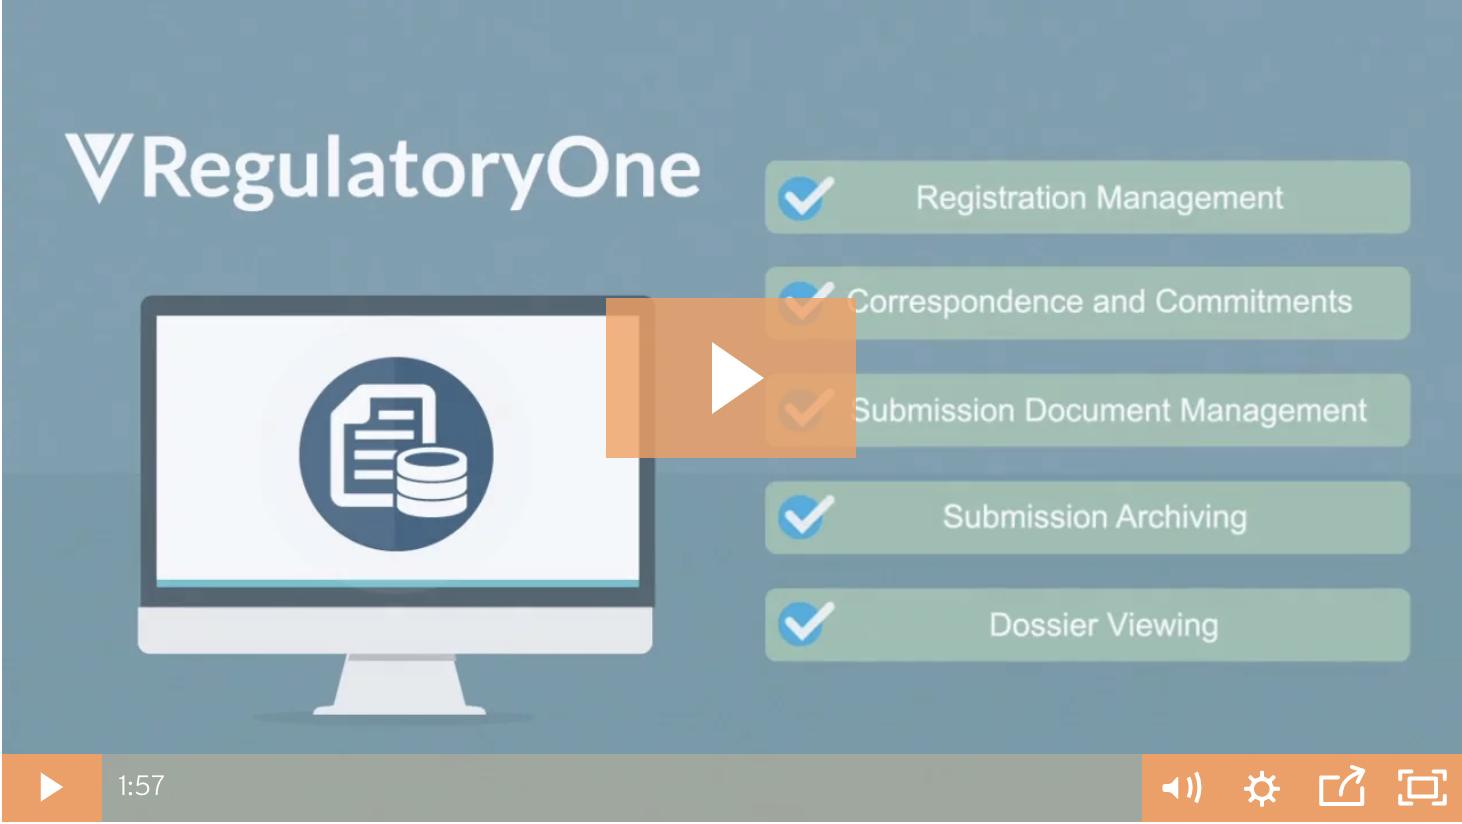 RegulatoryOne video